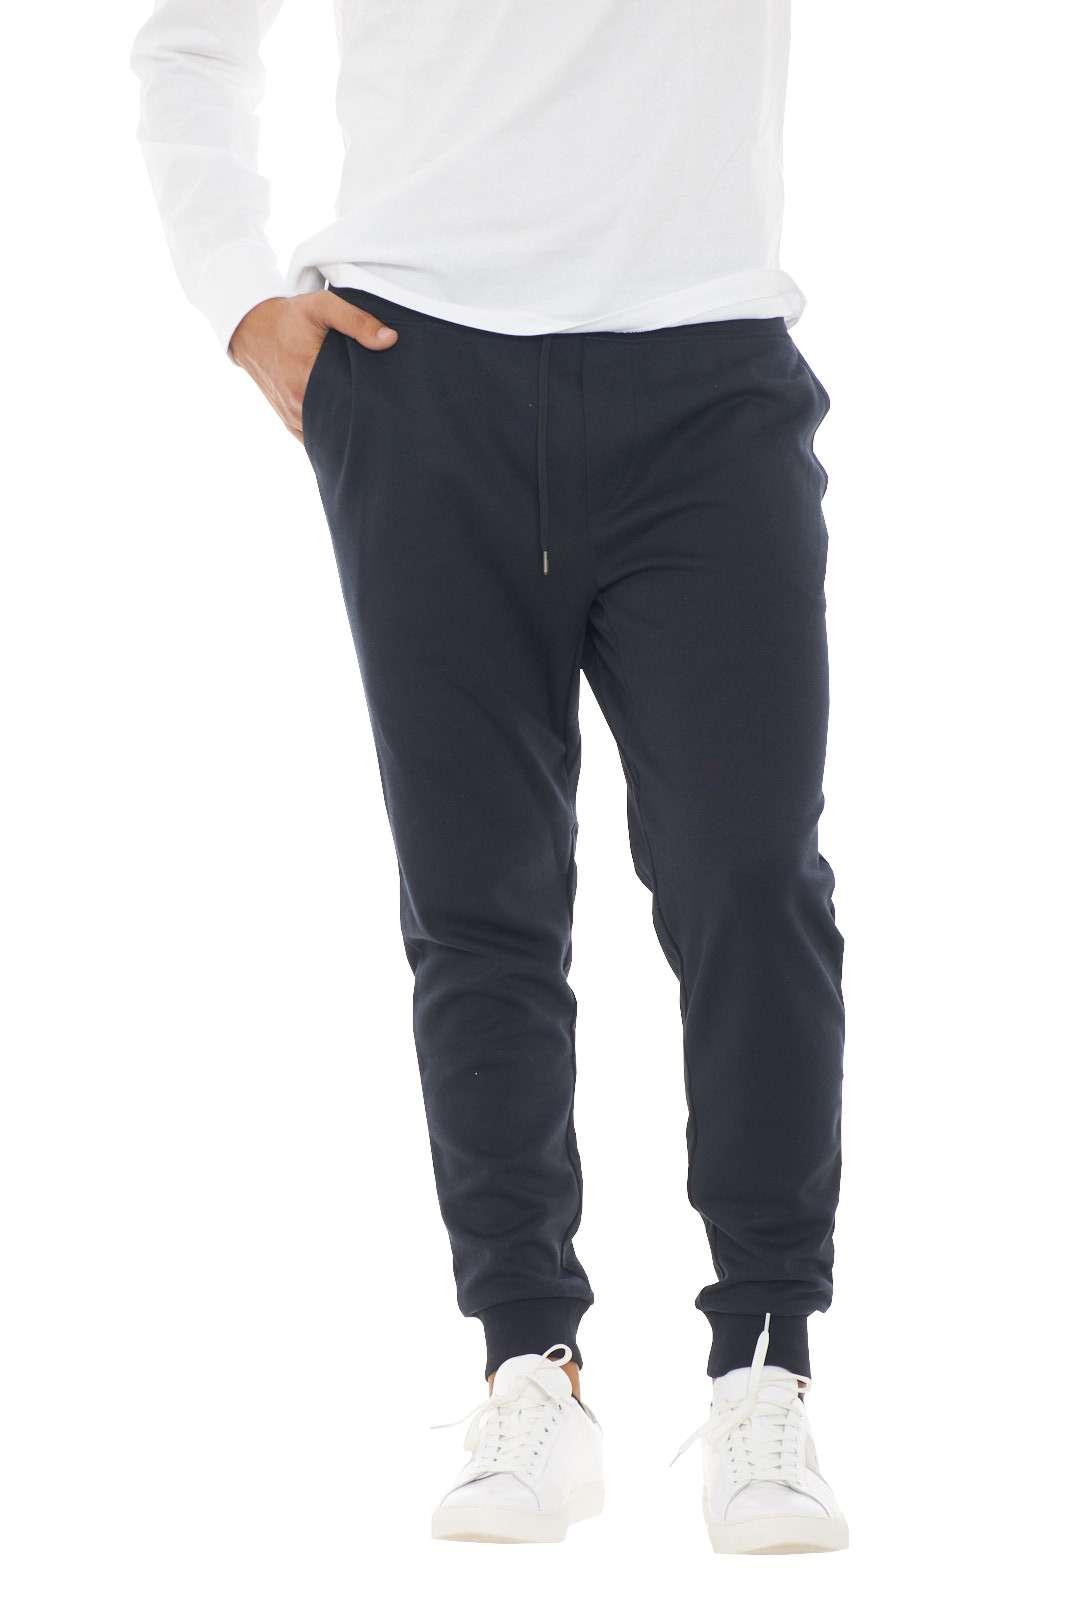 https://www.parmax.com/media/catalog/product/a/i/AI-outlet_parmax-pantaloni-uomo-Ralph-Lauren-710652314001-A_5.jpg